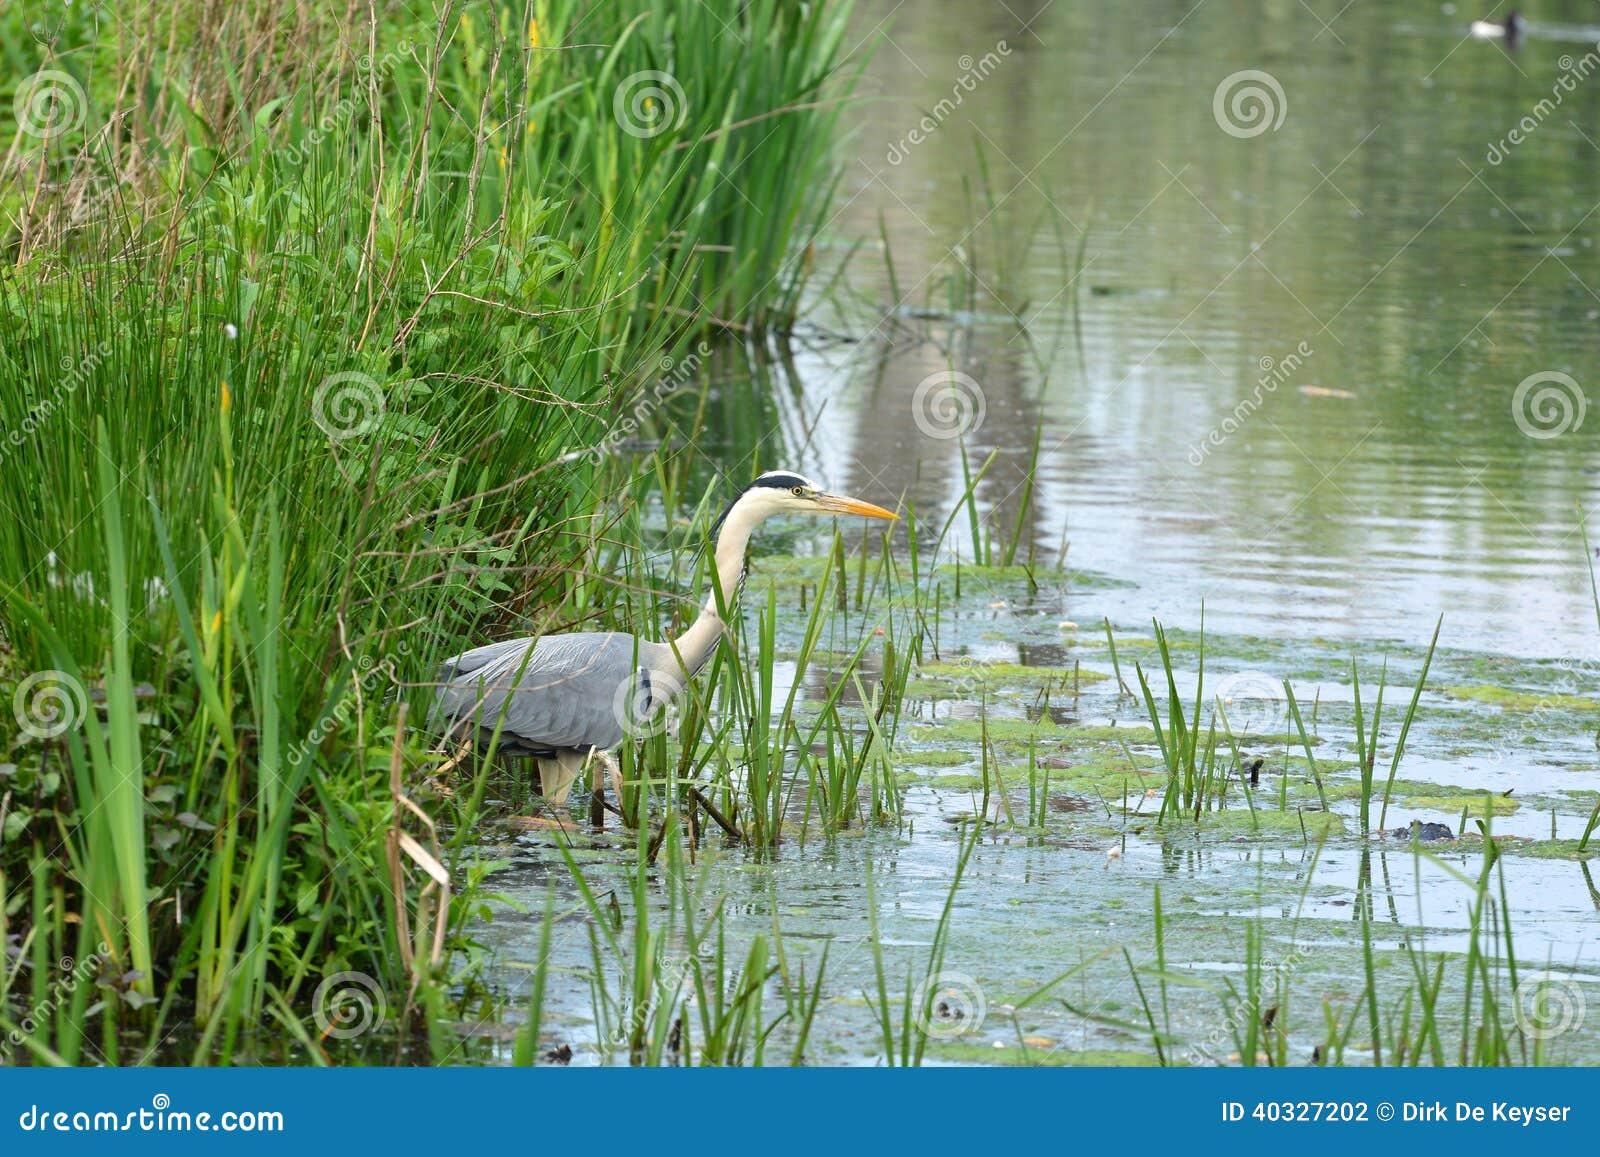 Great blue heron in nature reserve Bourgoyen